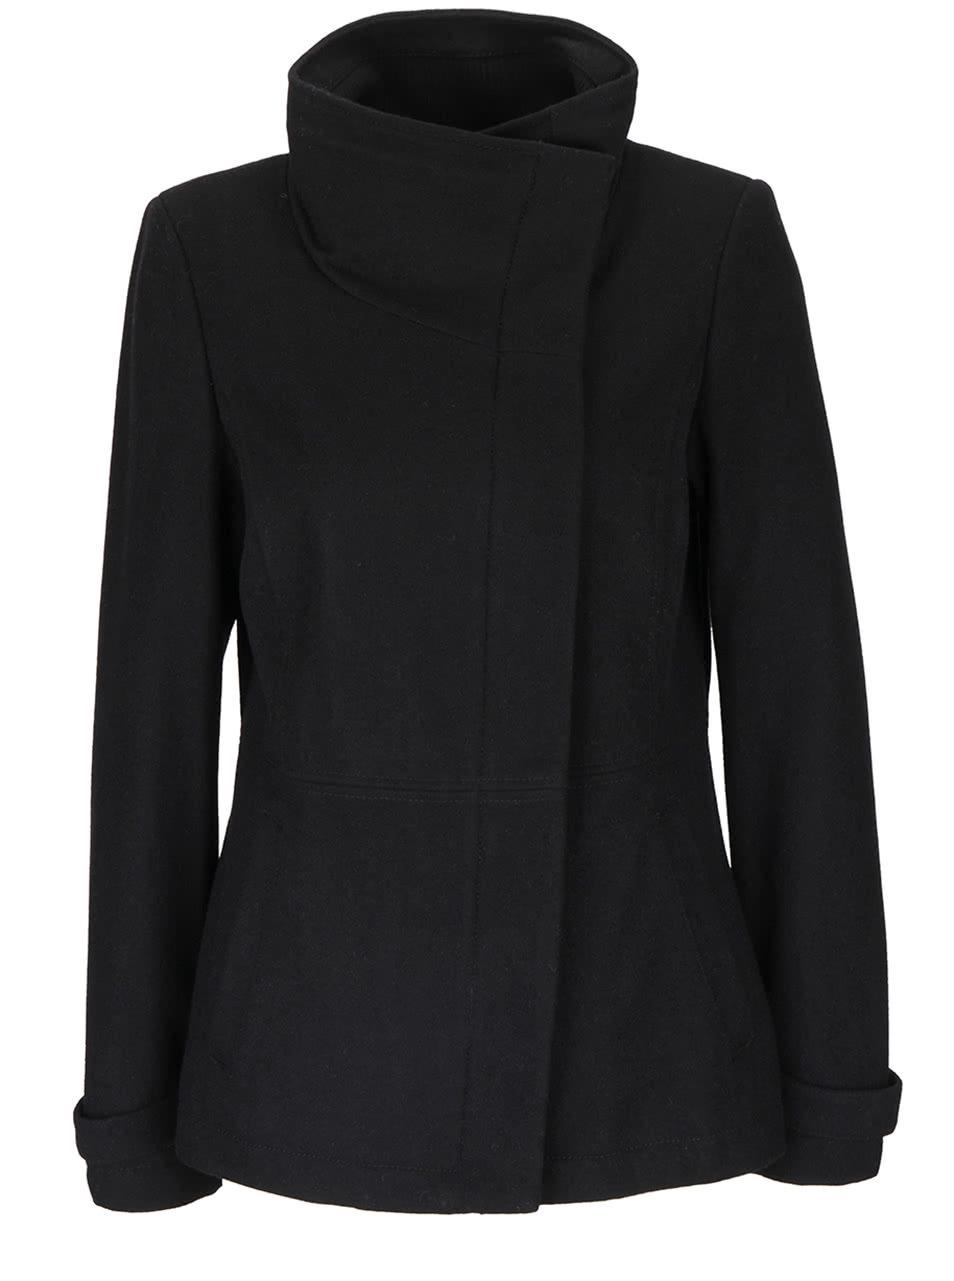 Čierny dámsky kabát s vysokým golierom s.Oliver  e3b9486a92d